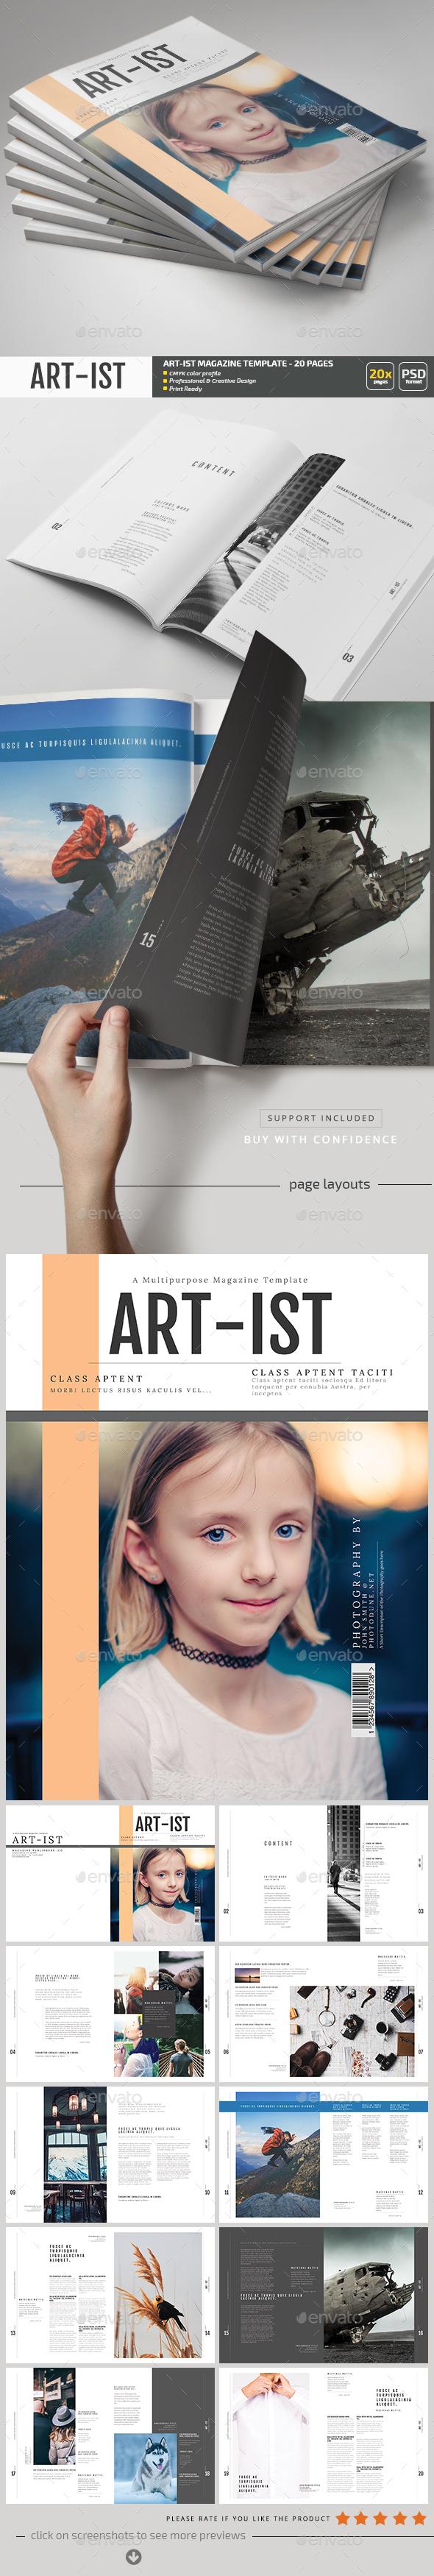 Art-ist Magazine Template V.17 - Magazines Print Templates